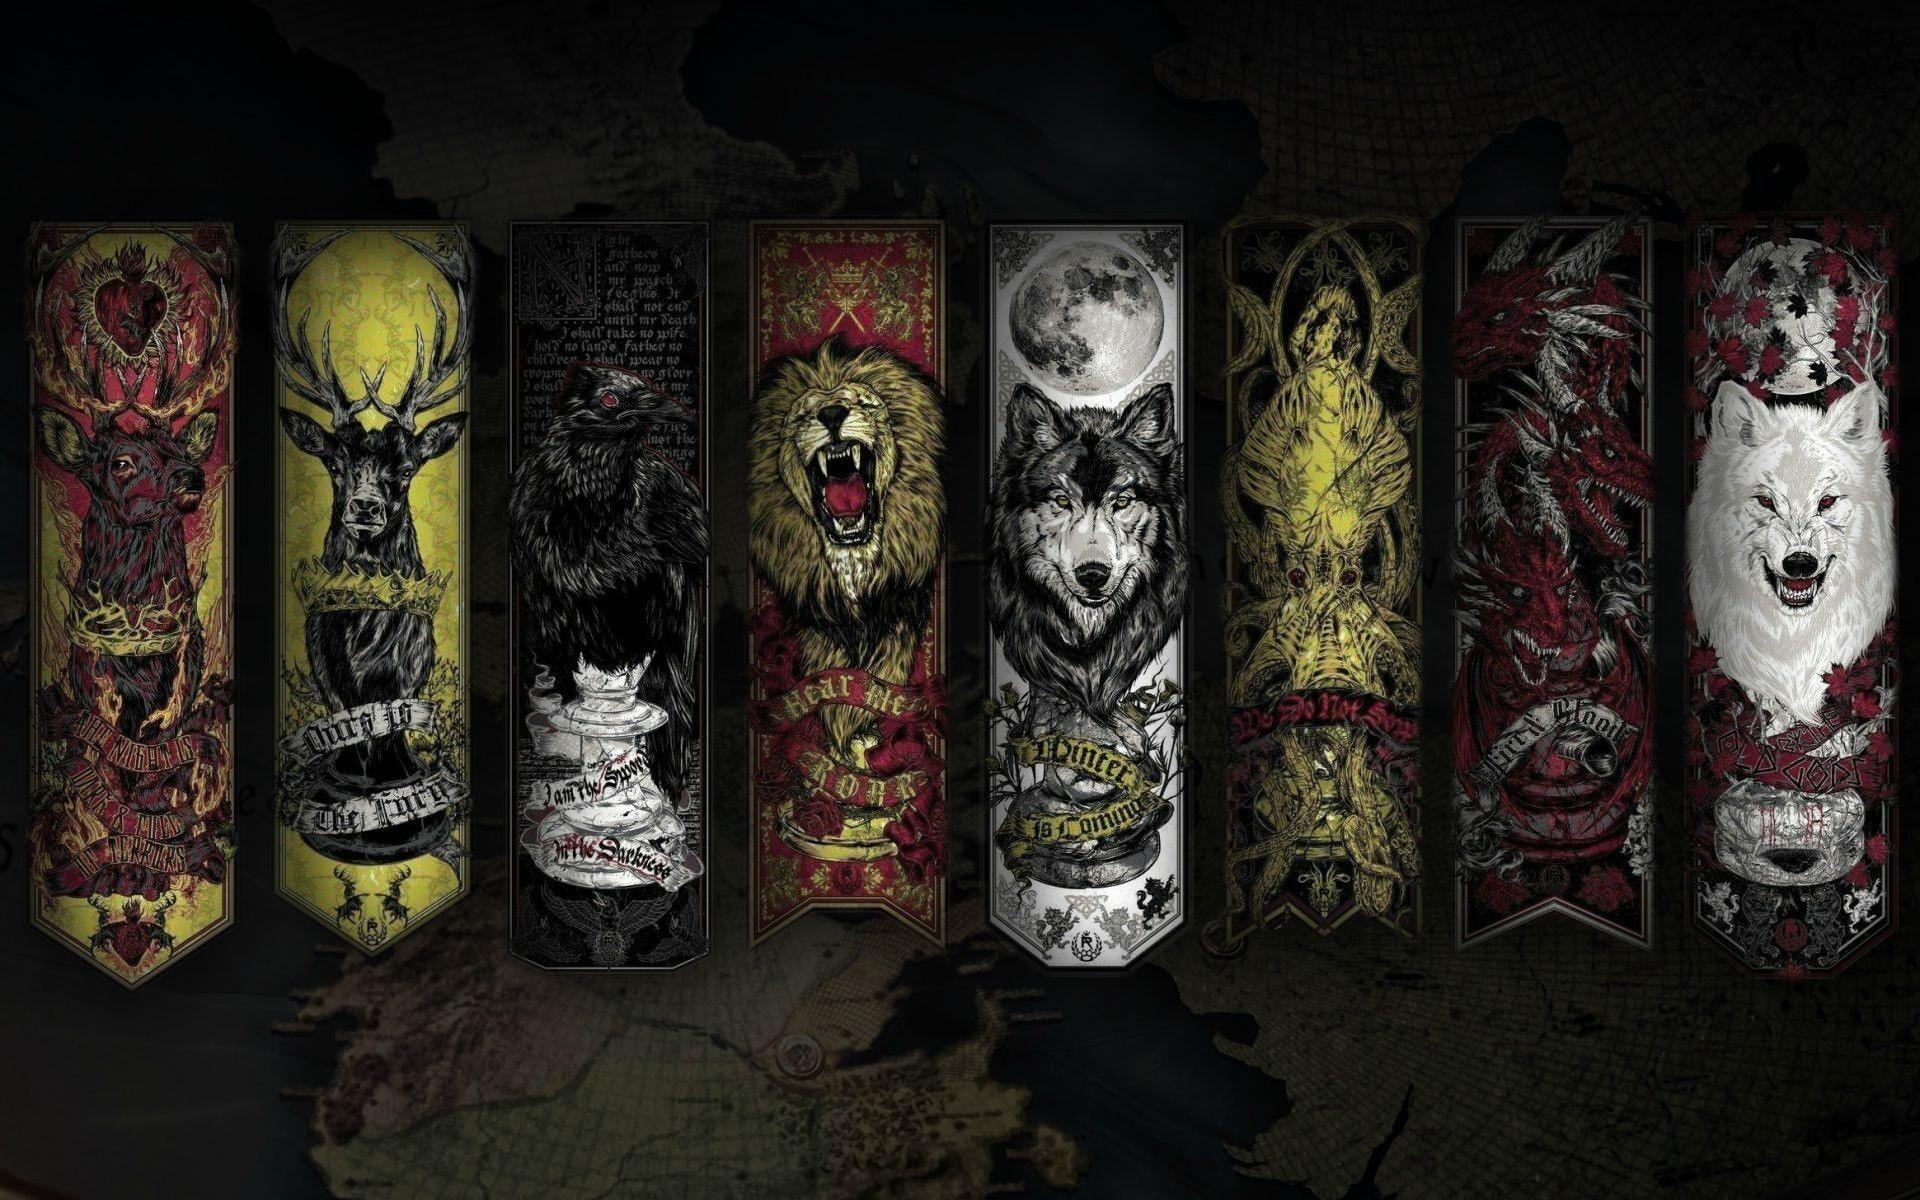 game of thrones last season wallpaper